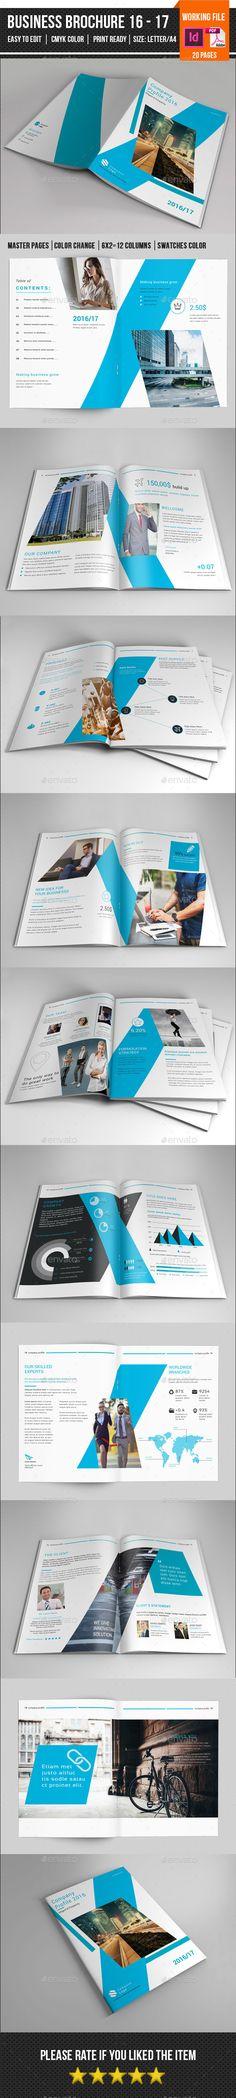 Business Brochure Template InDesign INDD